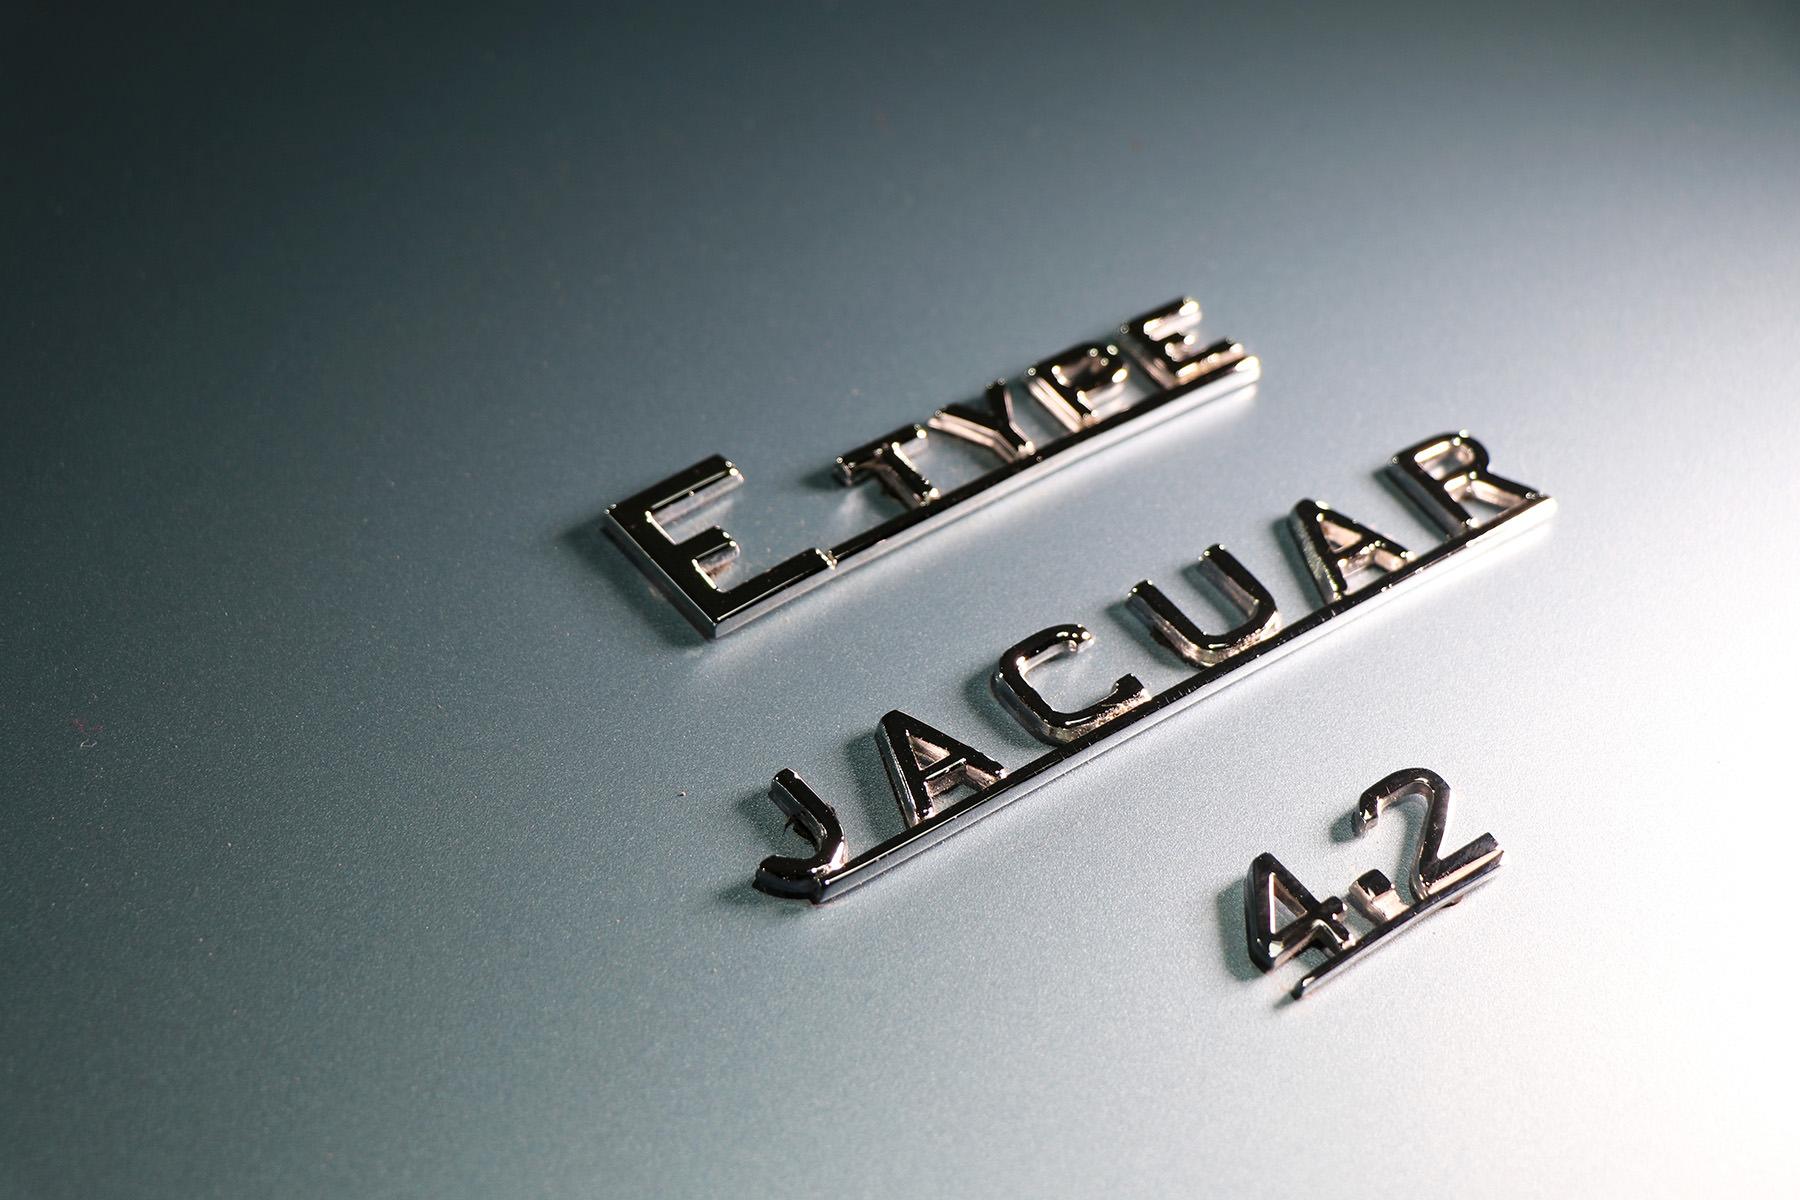 1966_opalescent_silver_blue_Jaguar_Sayer_etype_series _I_4_resized.jpg